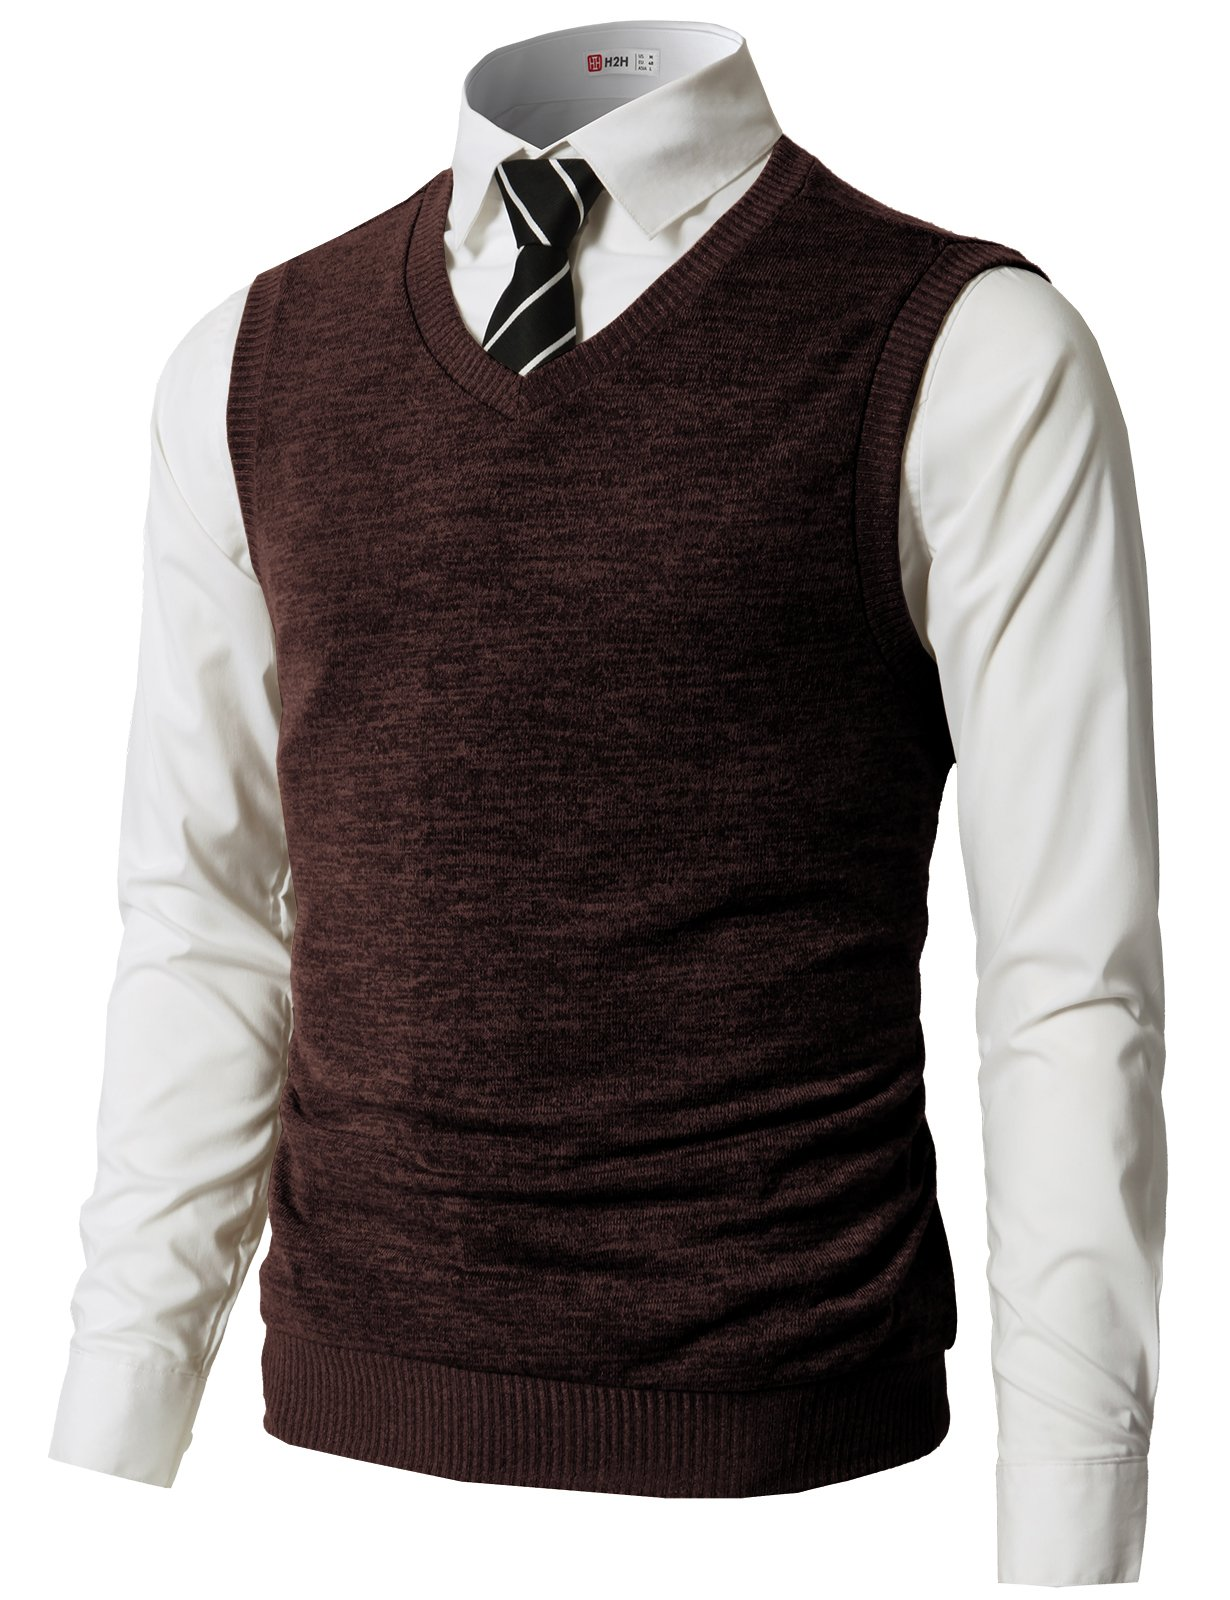 H2H Men's Perfect Slim Fit V-Neck Sweater Darkbrown US L/Asia XL (CMOV042)